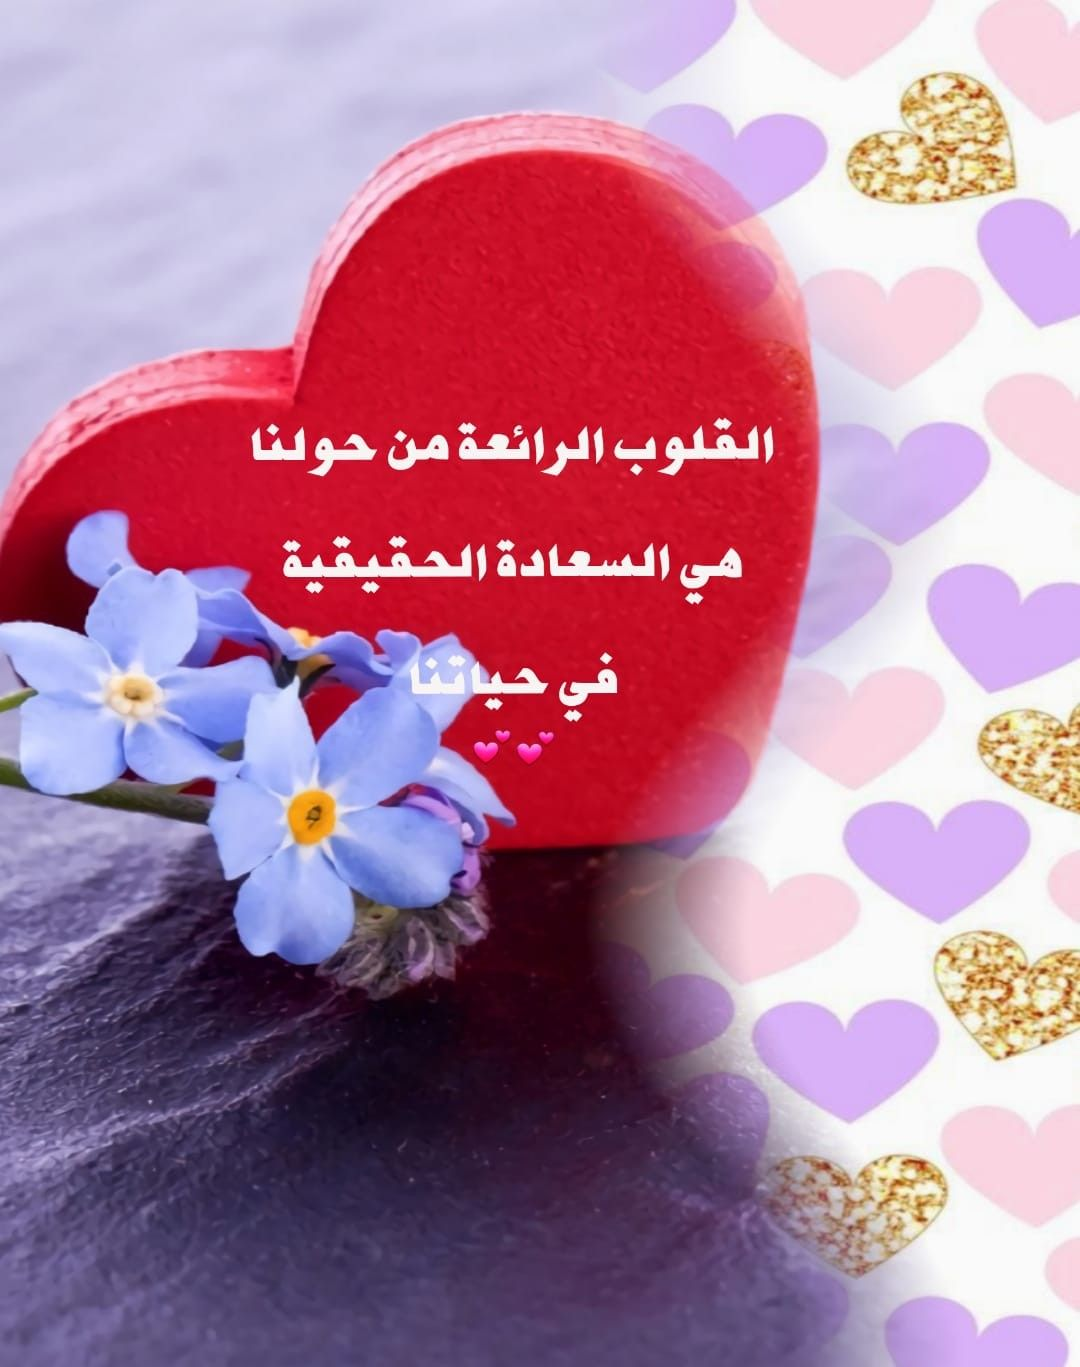 Pin By Eman Duniya On عربي رسائل من تصميمي Enamel Pins Enamel Pin